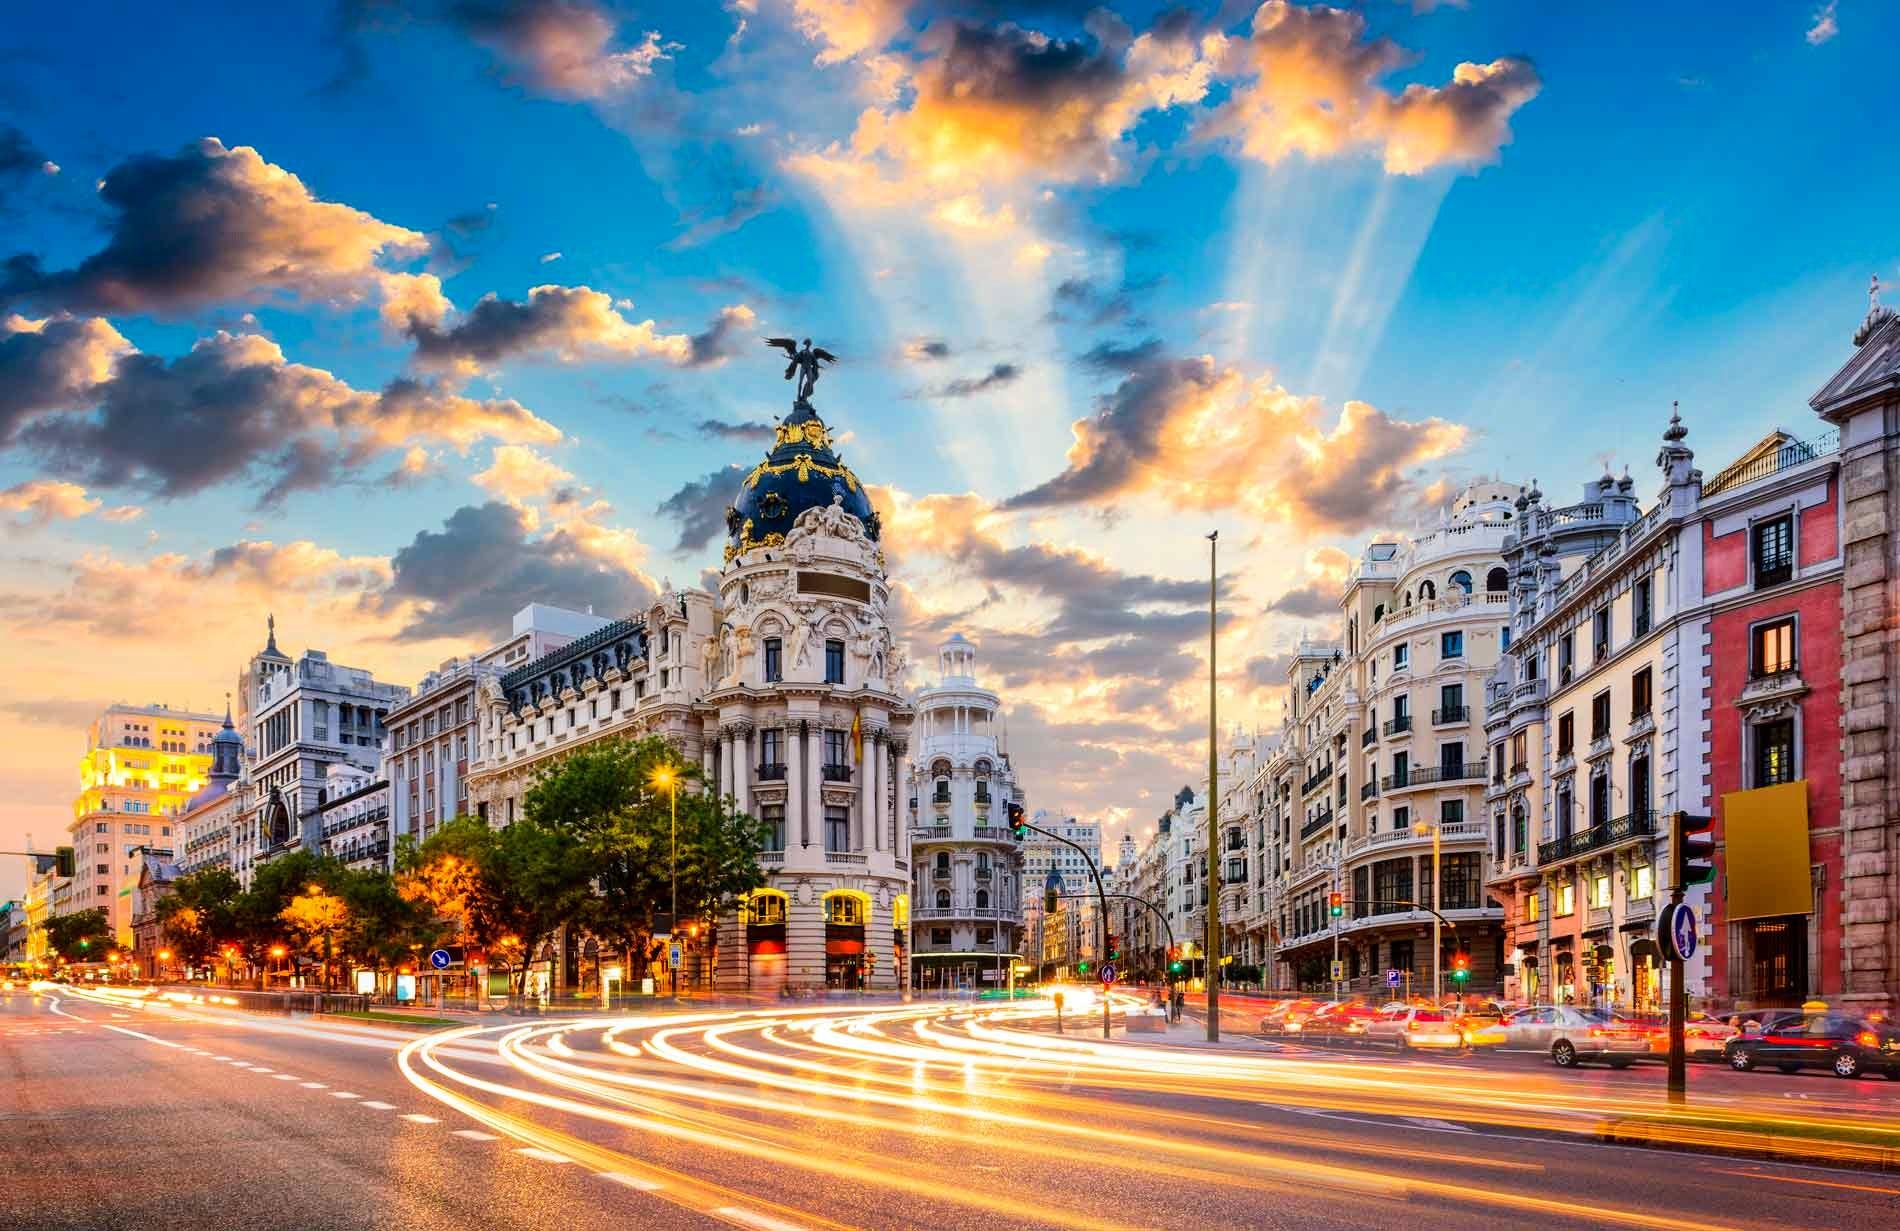 Universidad Politecnica de Madrid- A short guide to the student life.